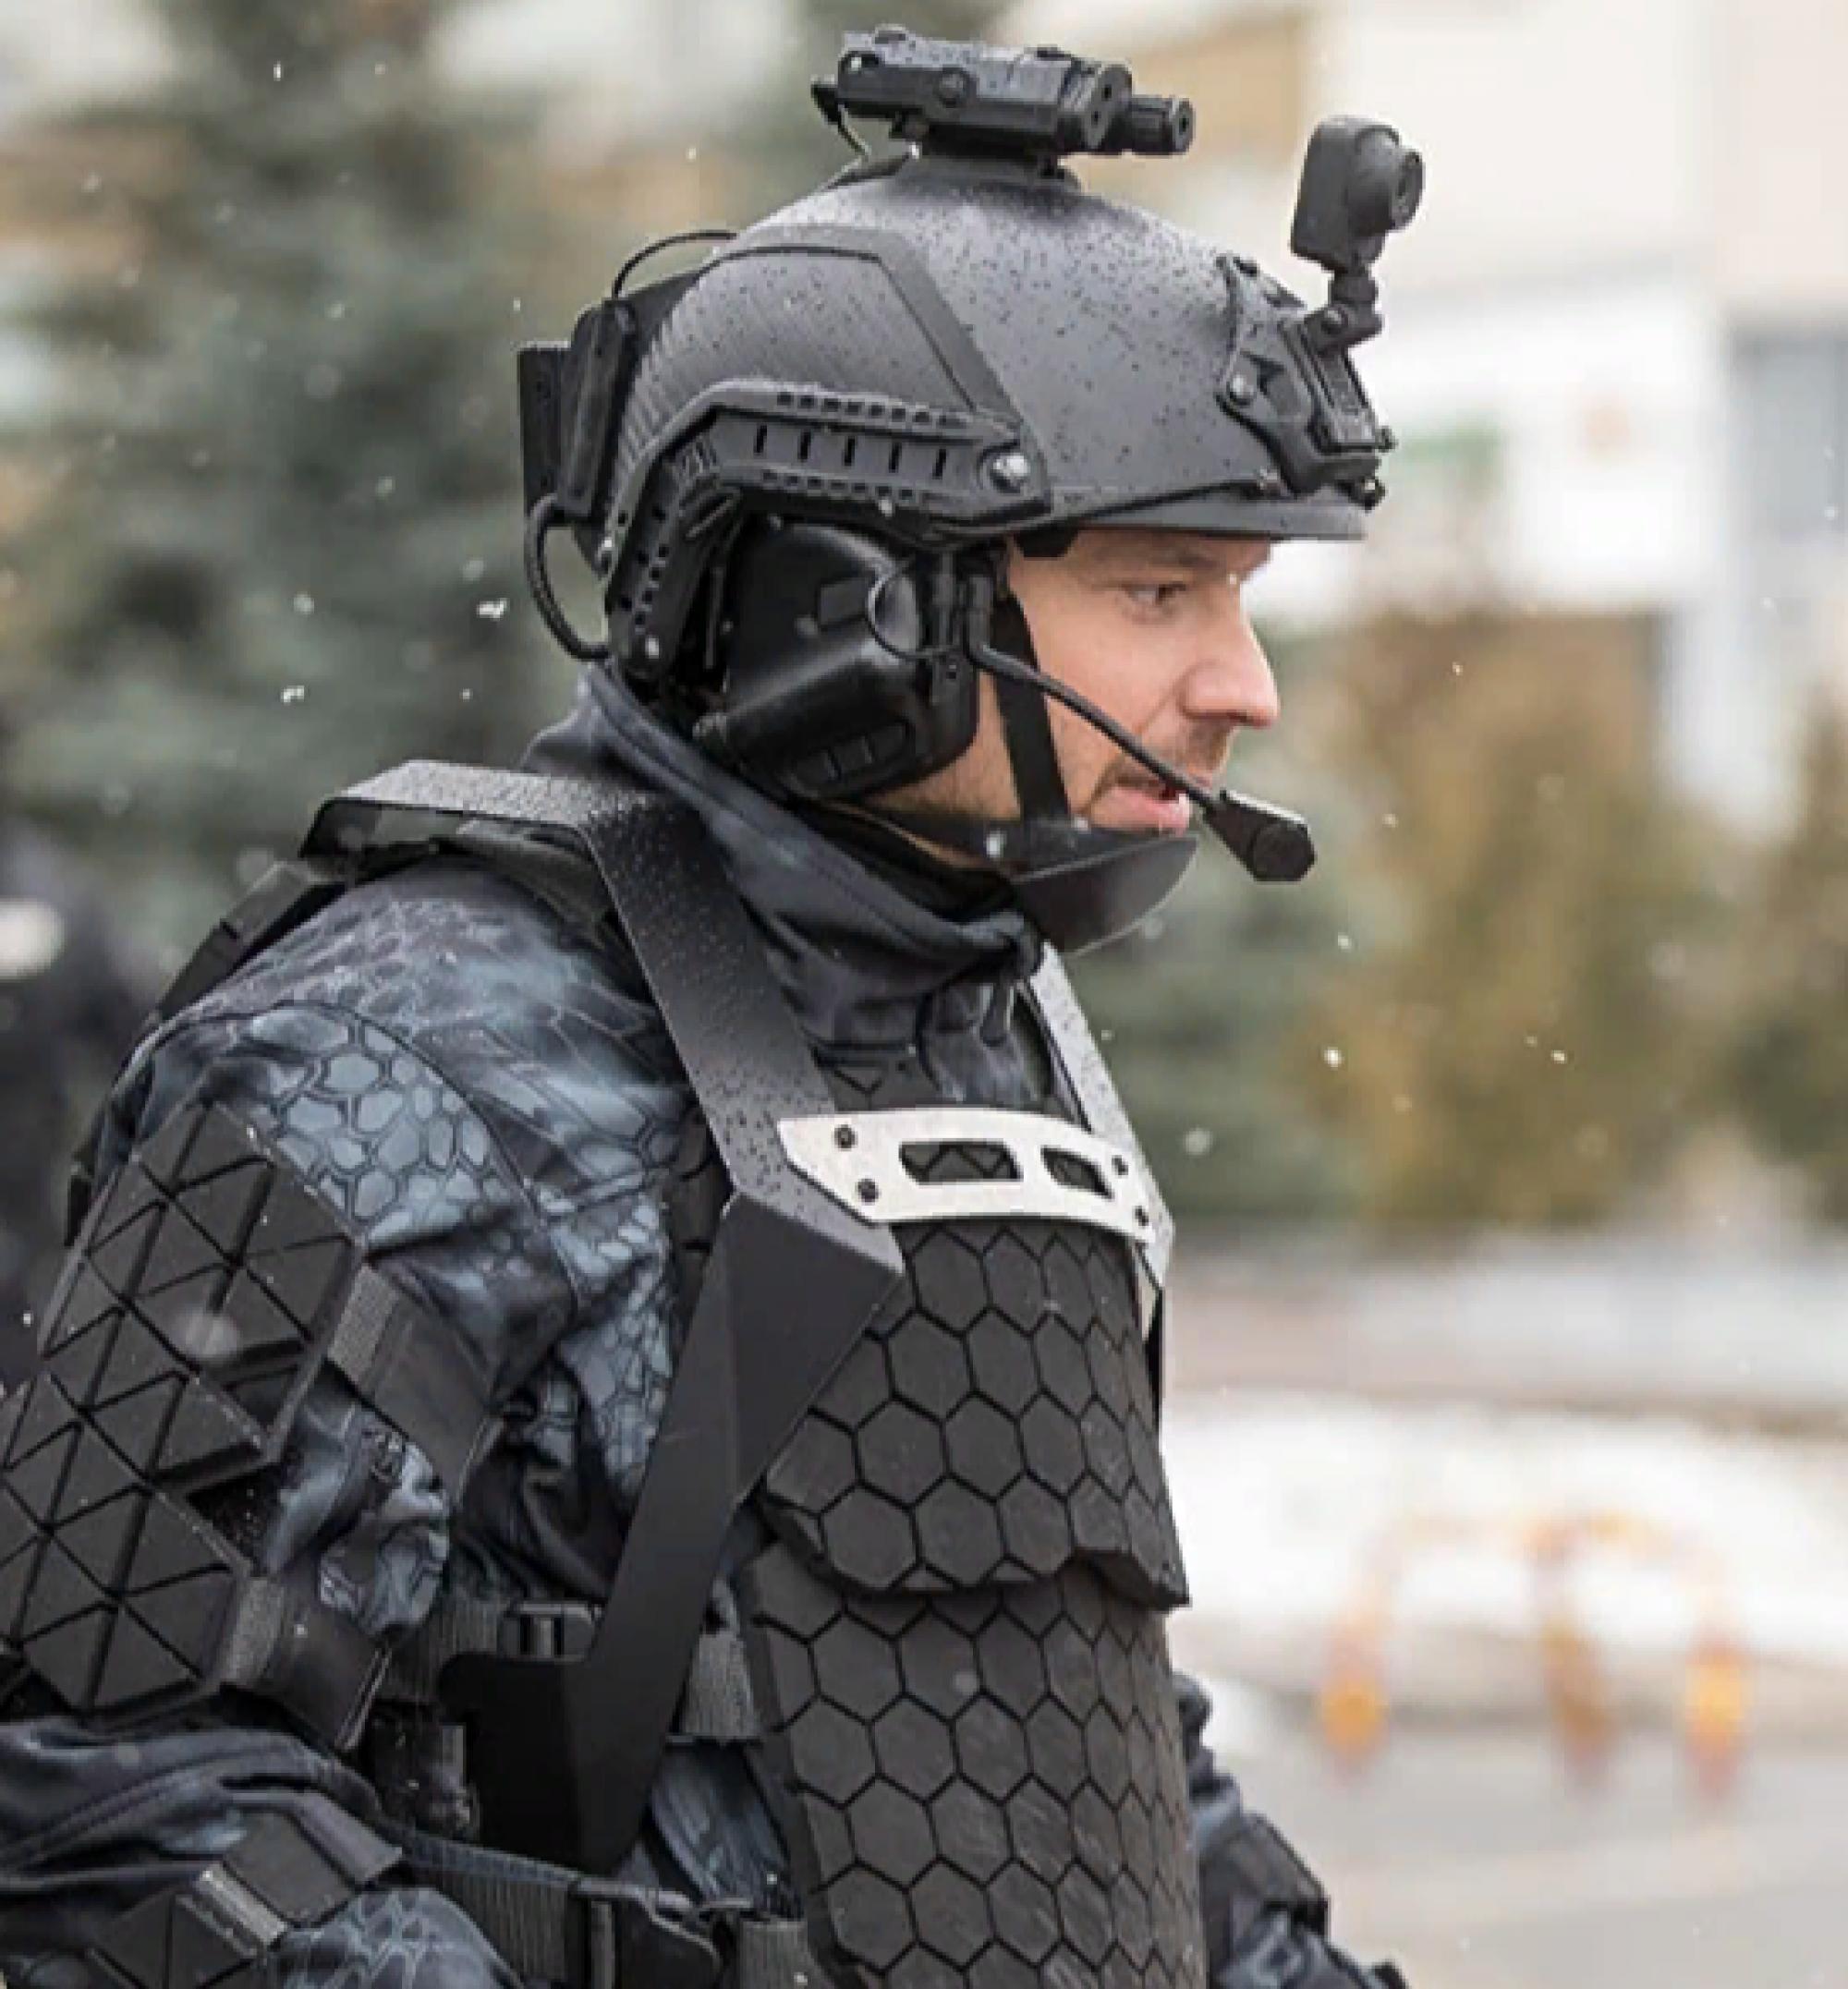 Российский фильм «Аванпост» откроет японский прокат после карантина